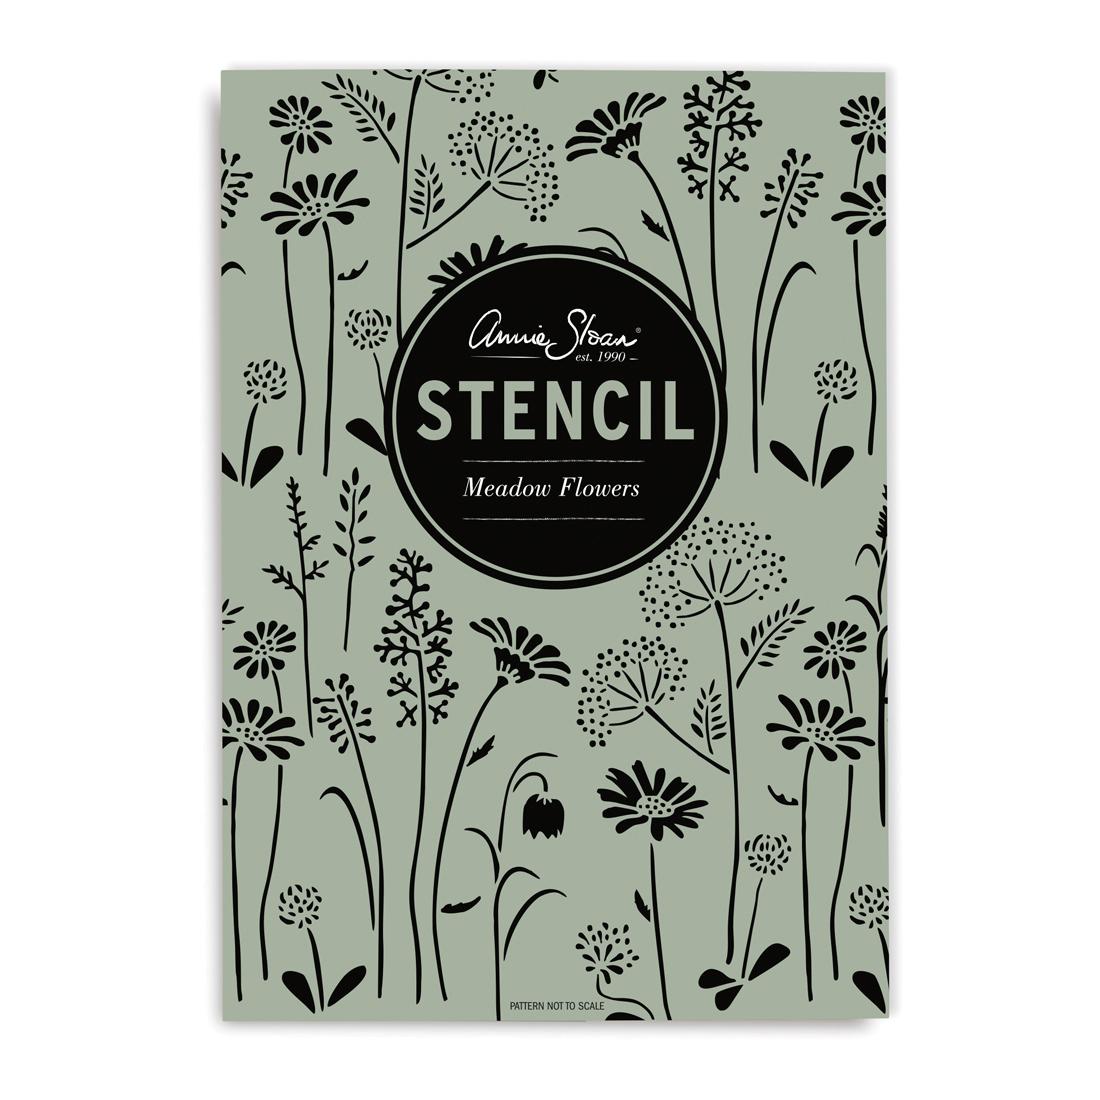 Meadow-Flowers-Stencil-Front